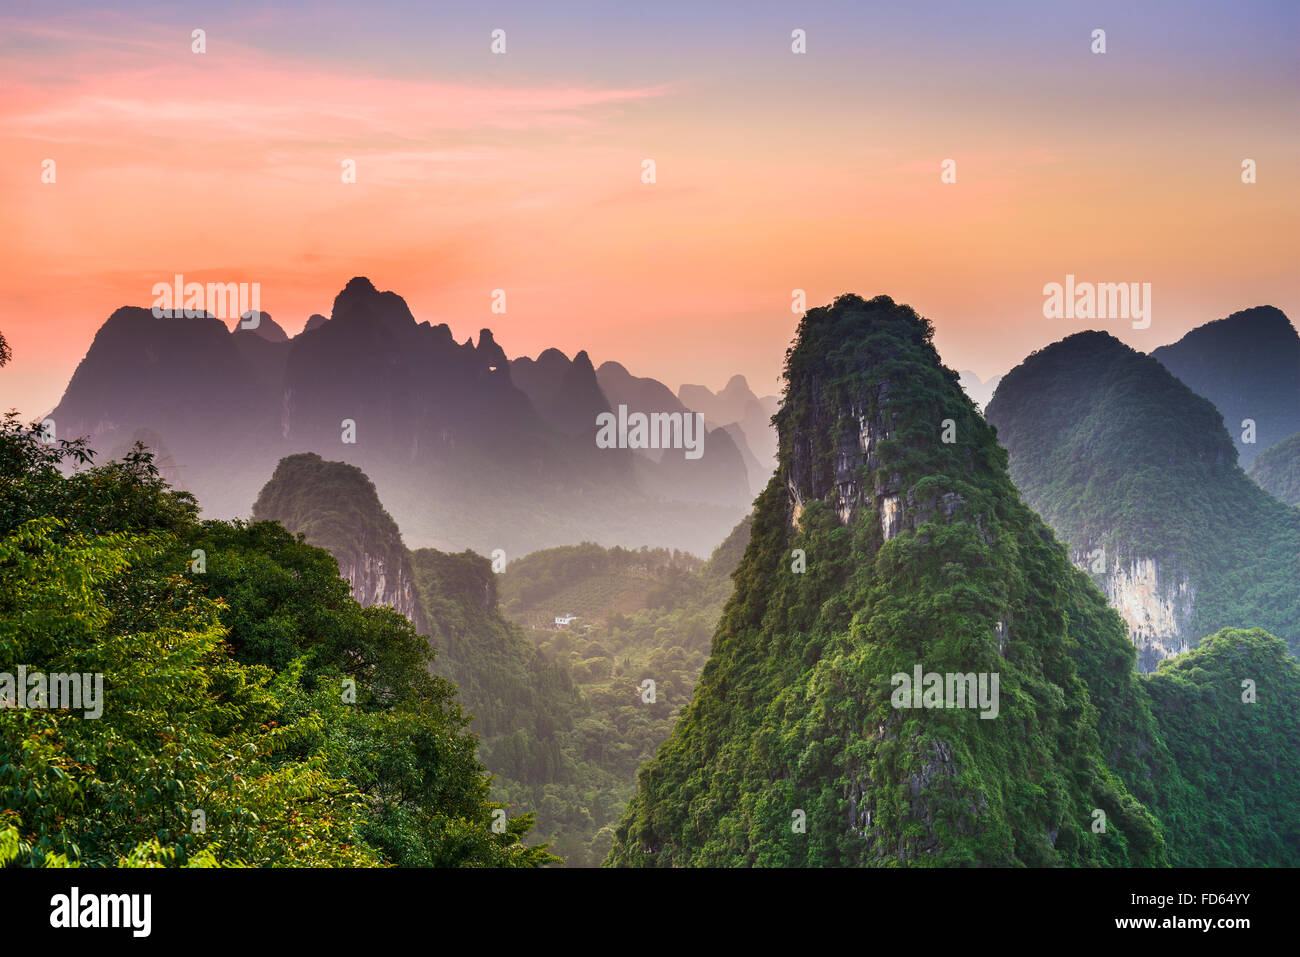 Karst Mountains of Xingping, Guilin, China. - Stock Image